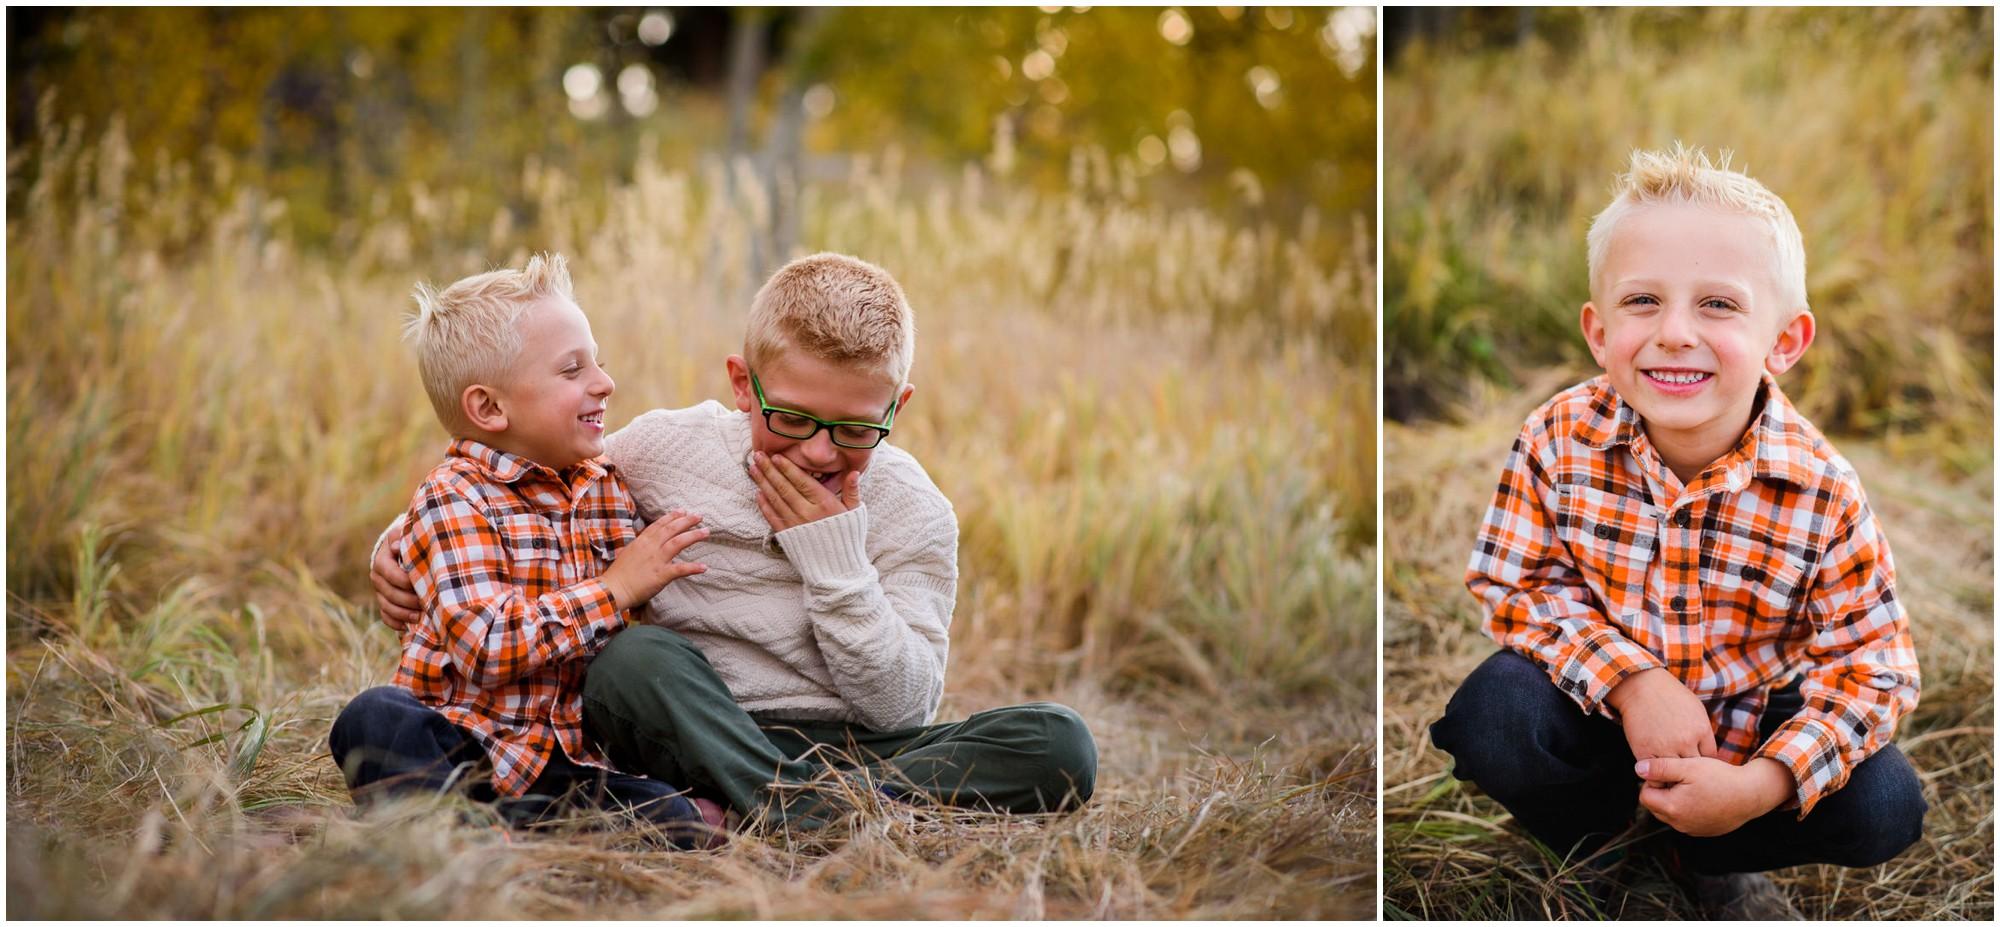 54-meyer-ranch-fall-family-photography-evans.jpg